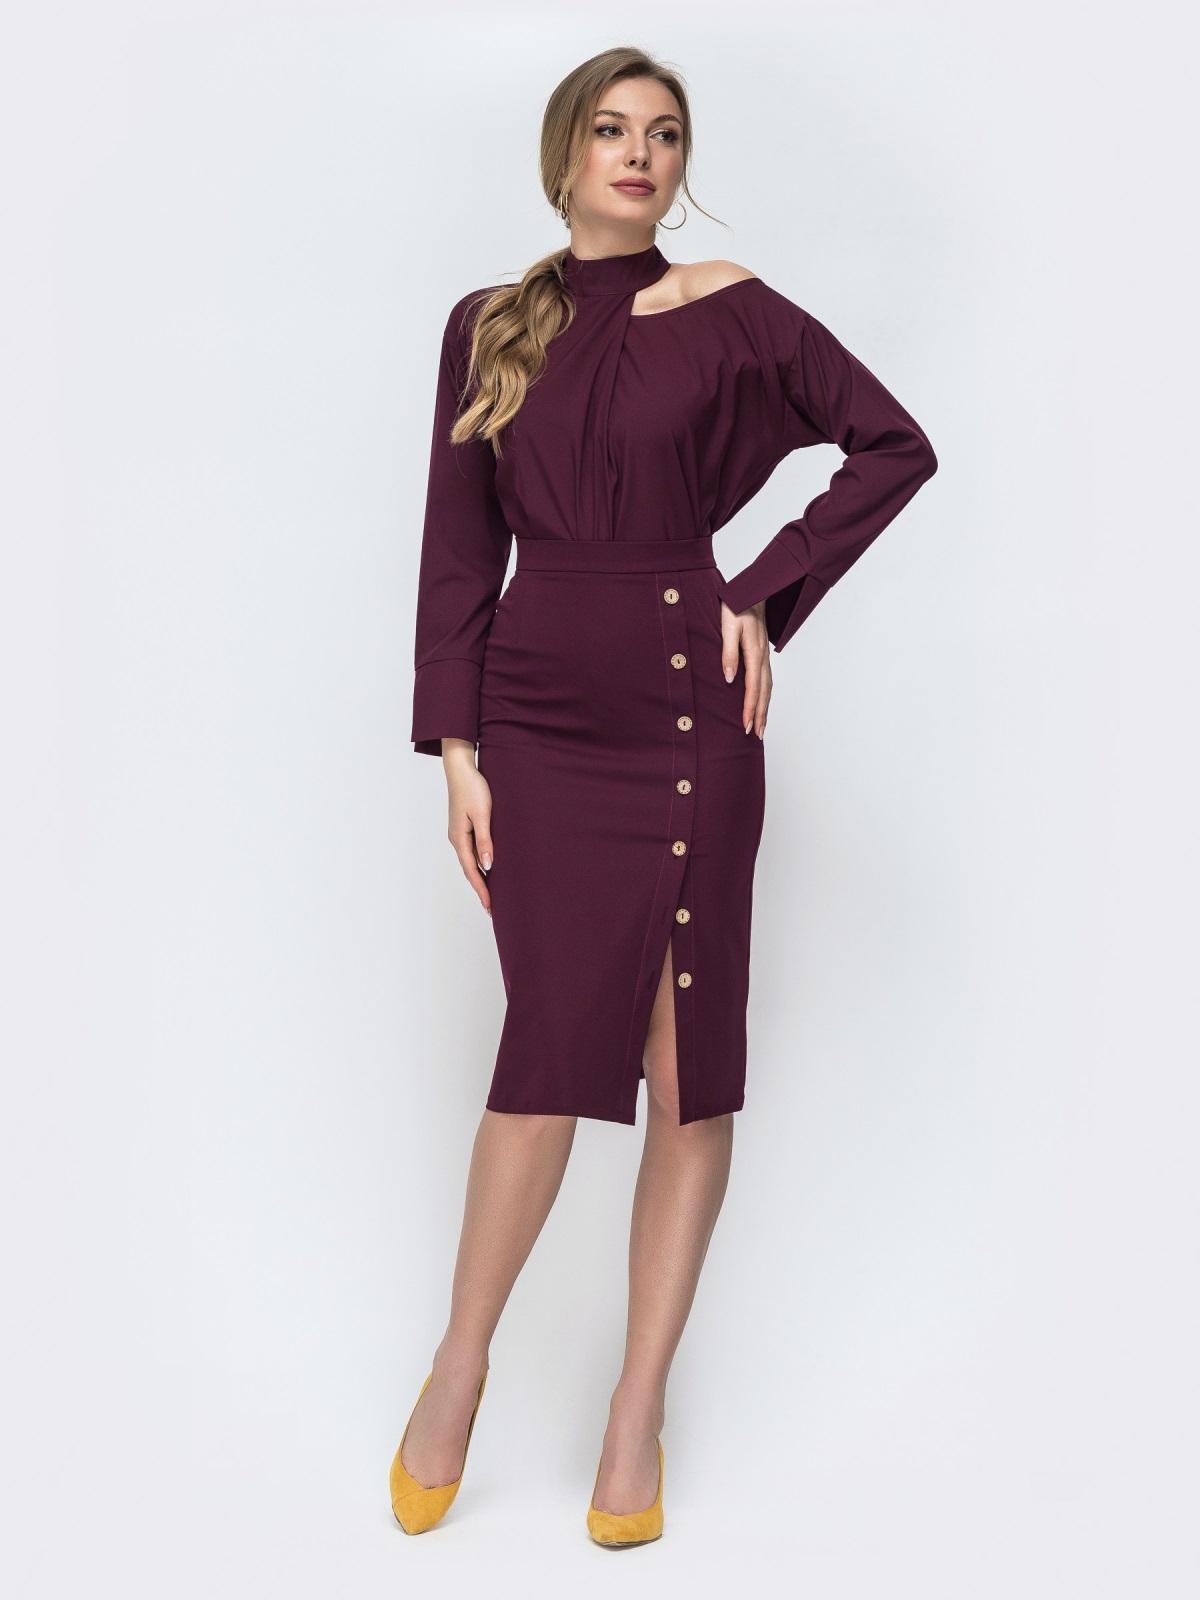 Бордовый комплект из блузки и юбки-карандаш 45653, фото 1